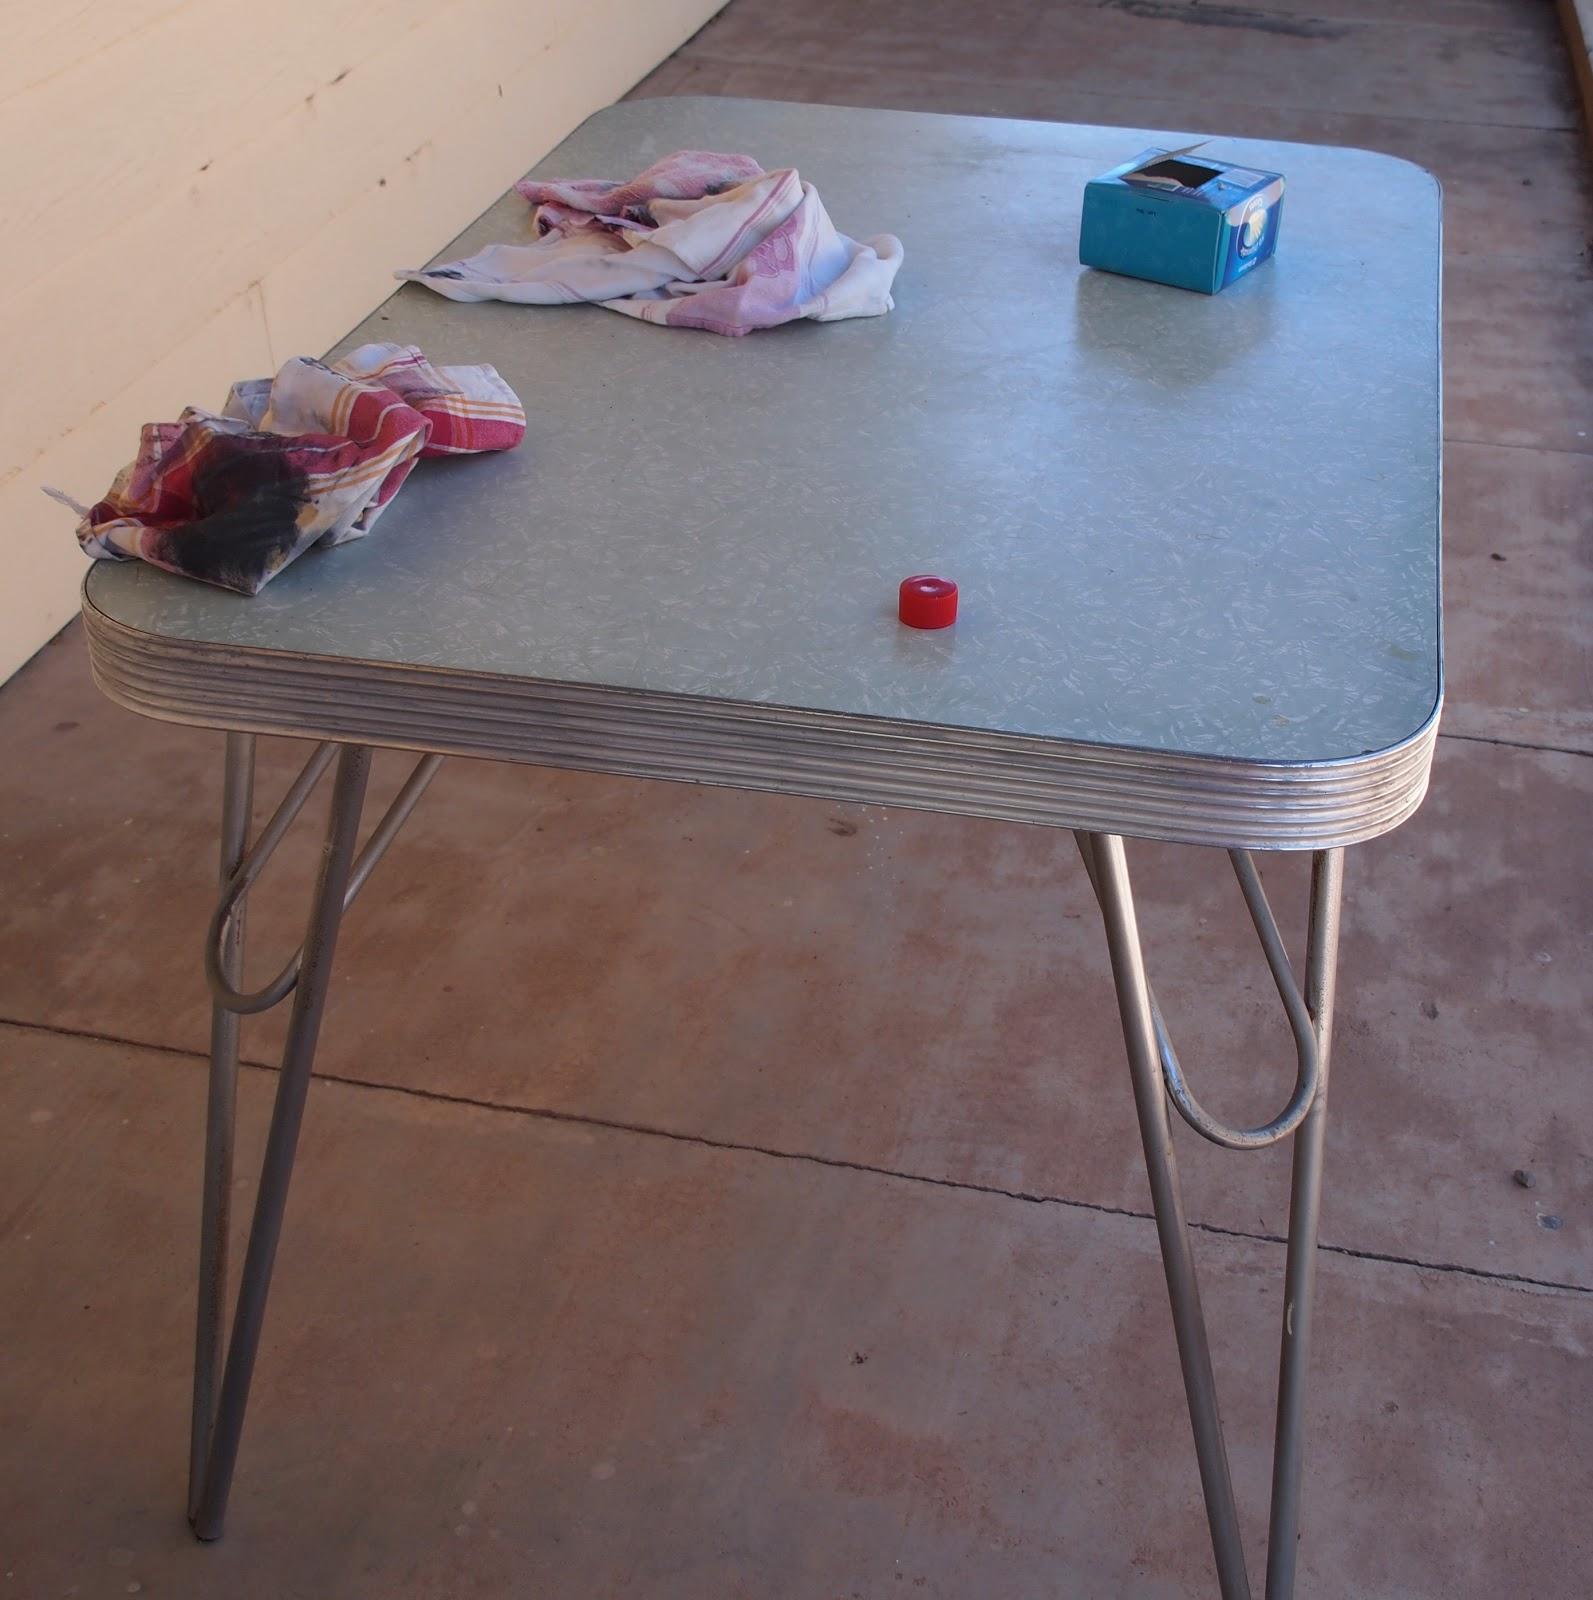 fixing up s chrome kitchen table s kitchen table Fixing up a s chrome kitchen table